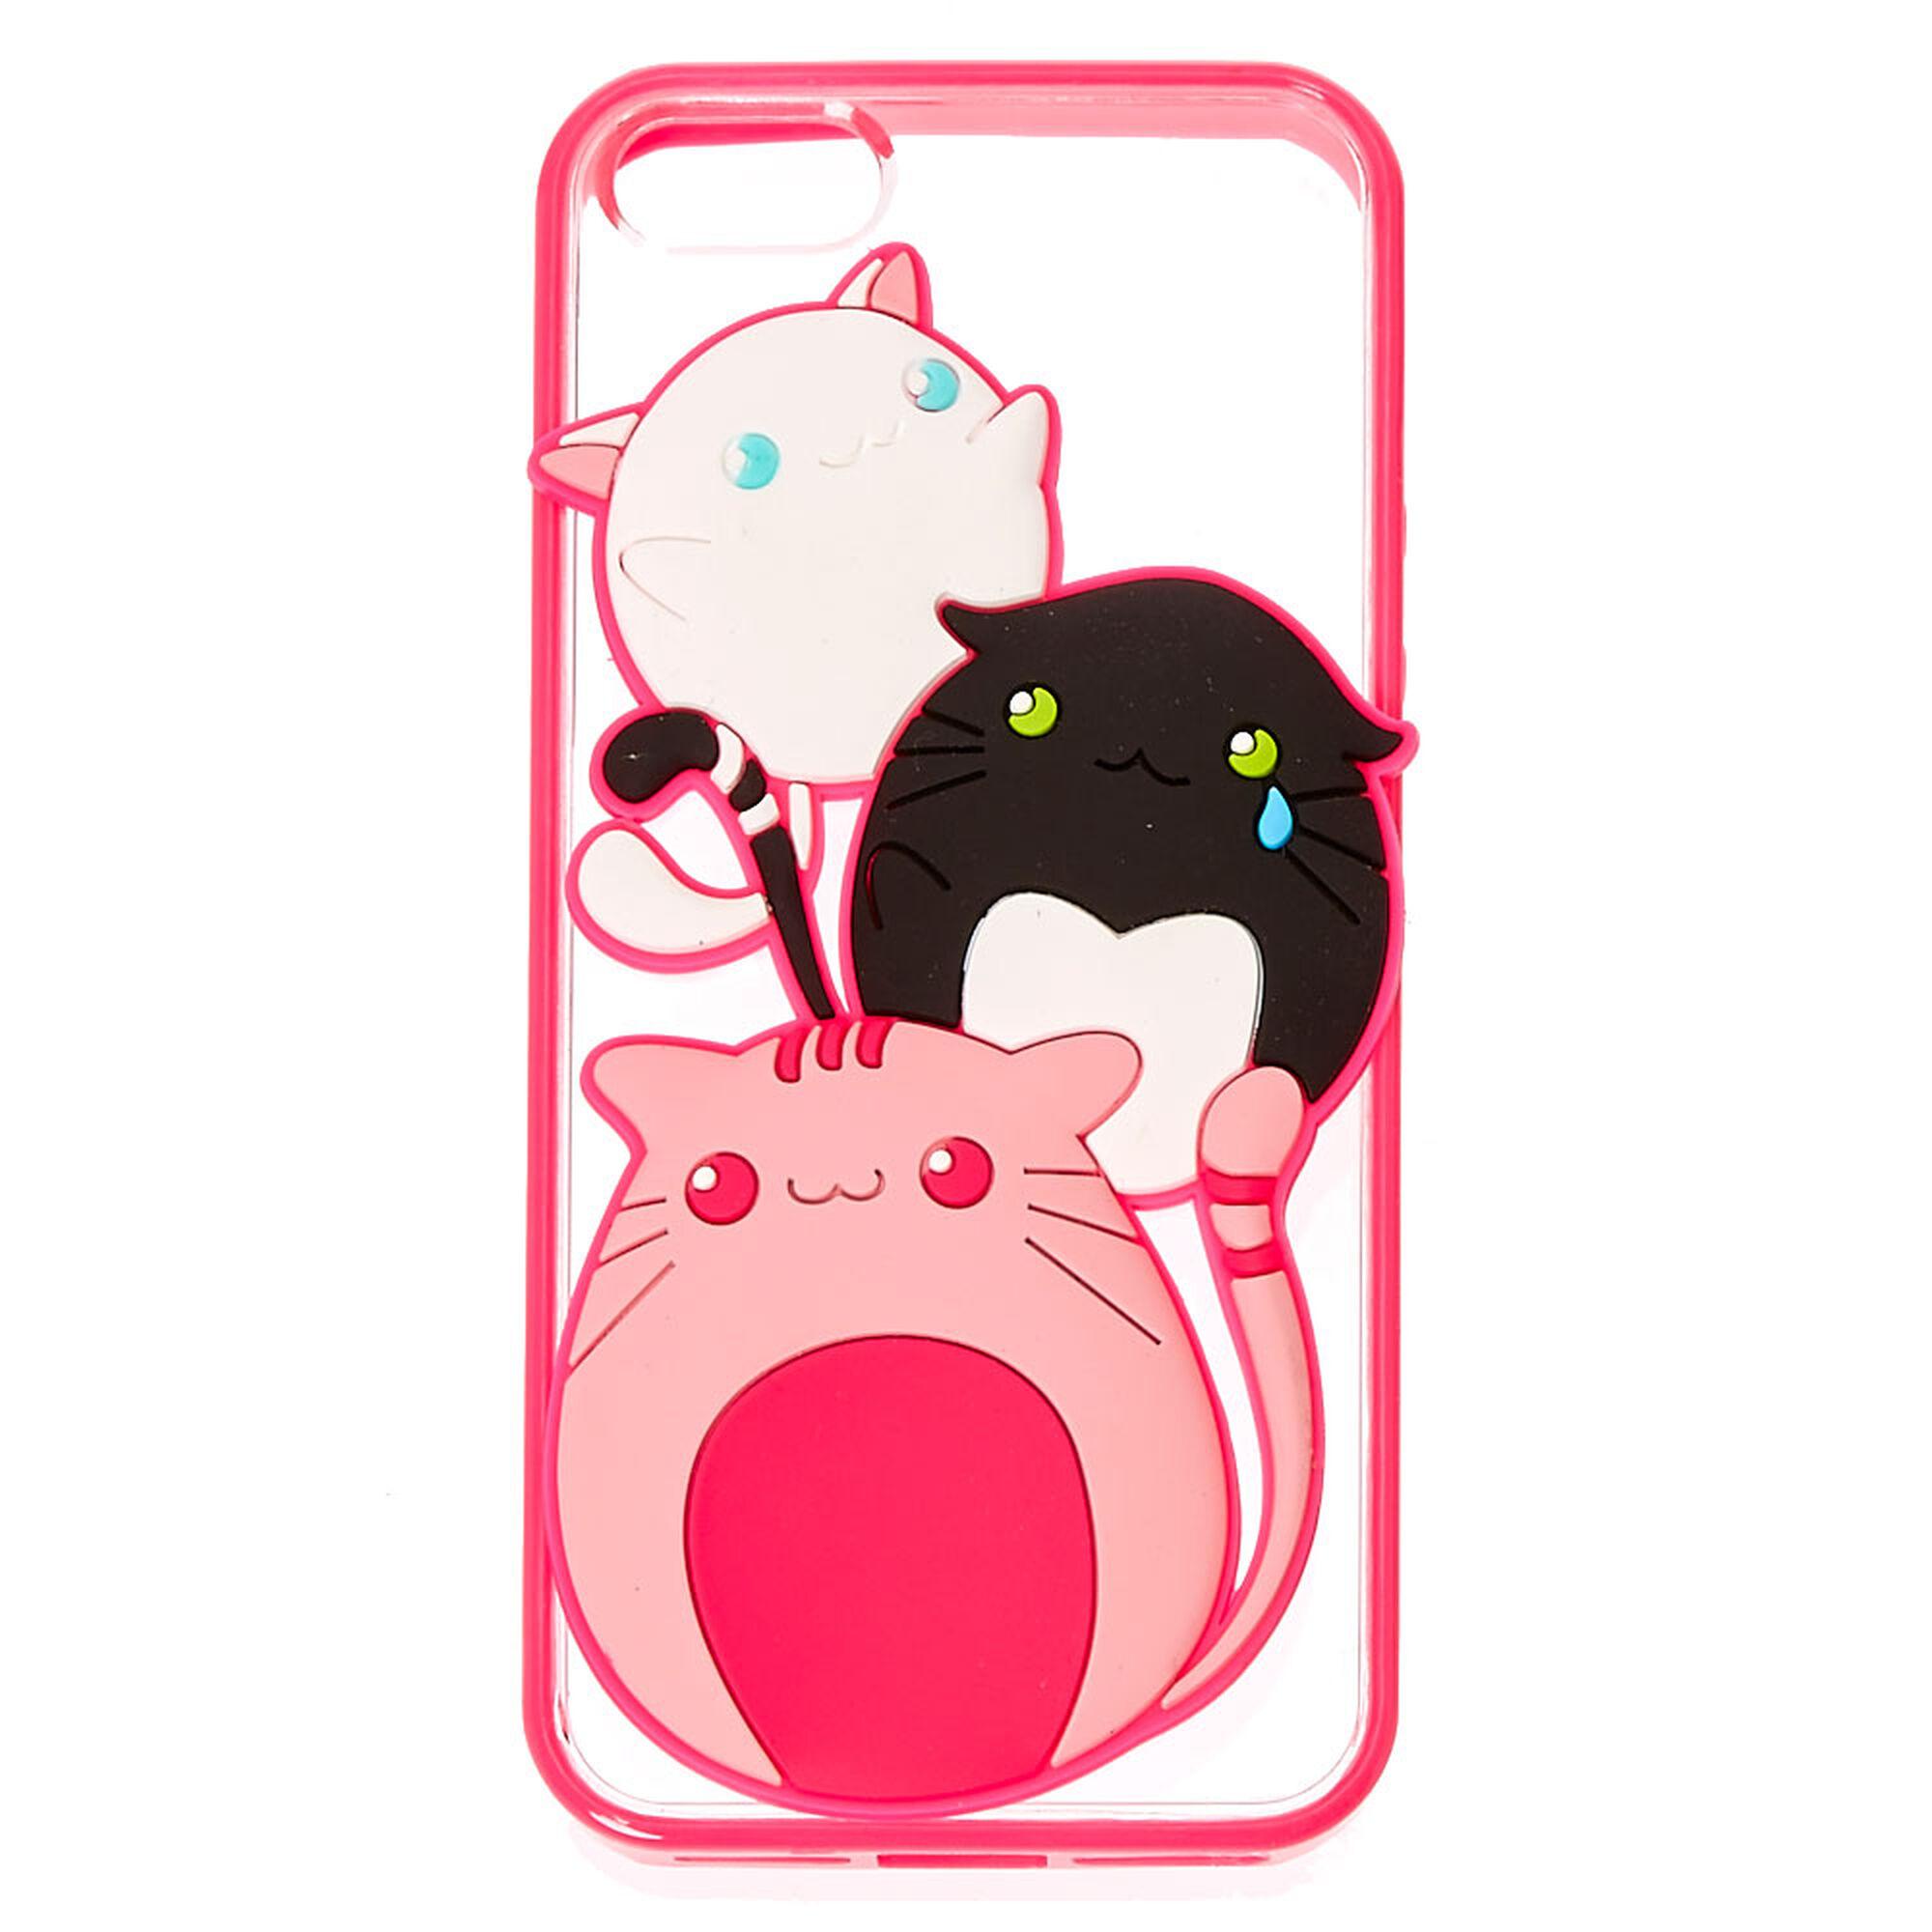 Anime Phone Cases Iphone